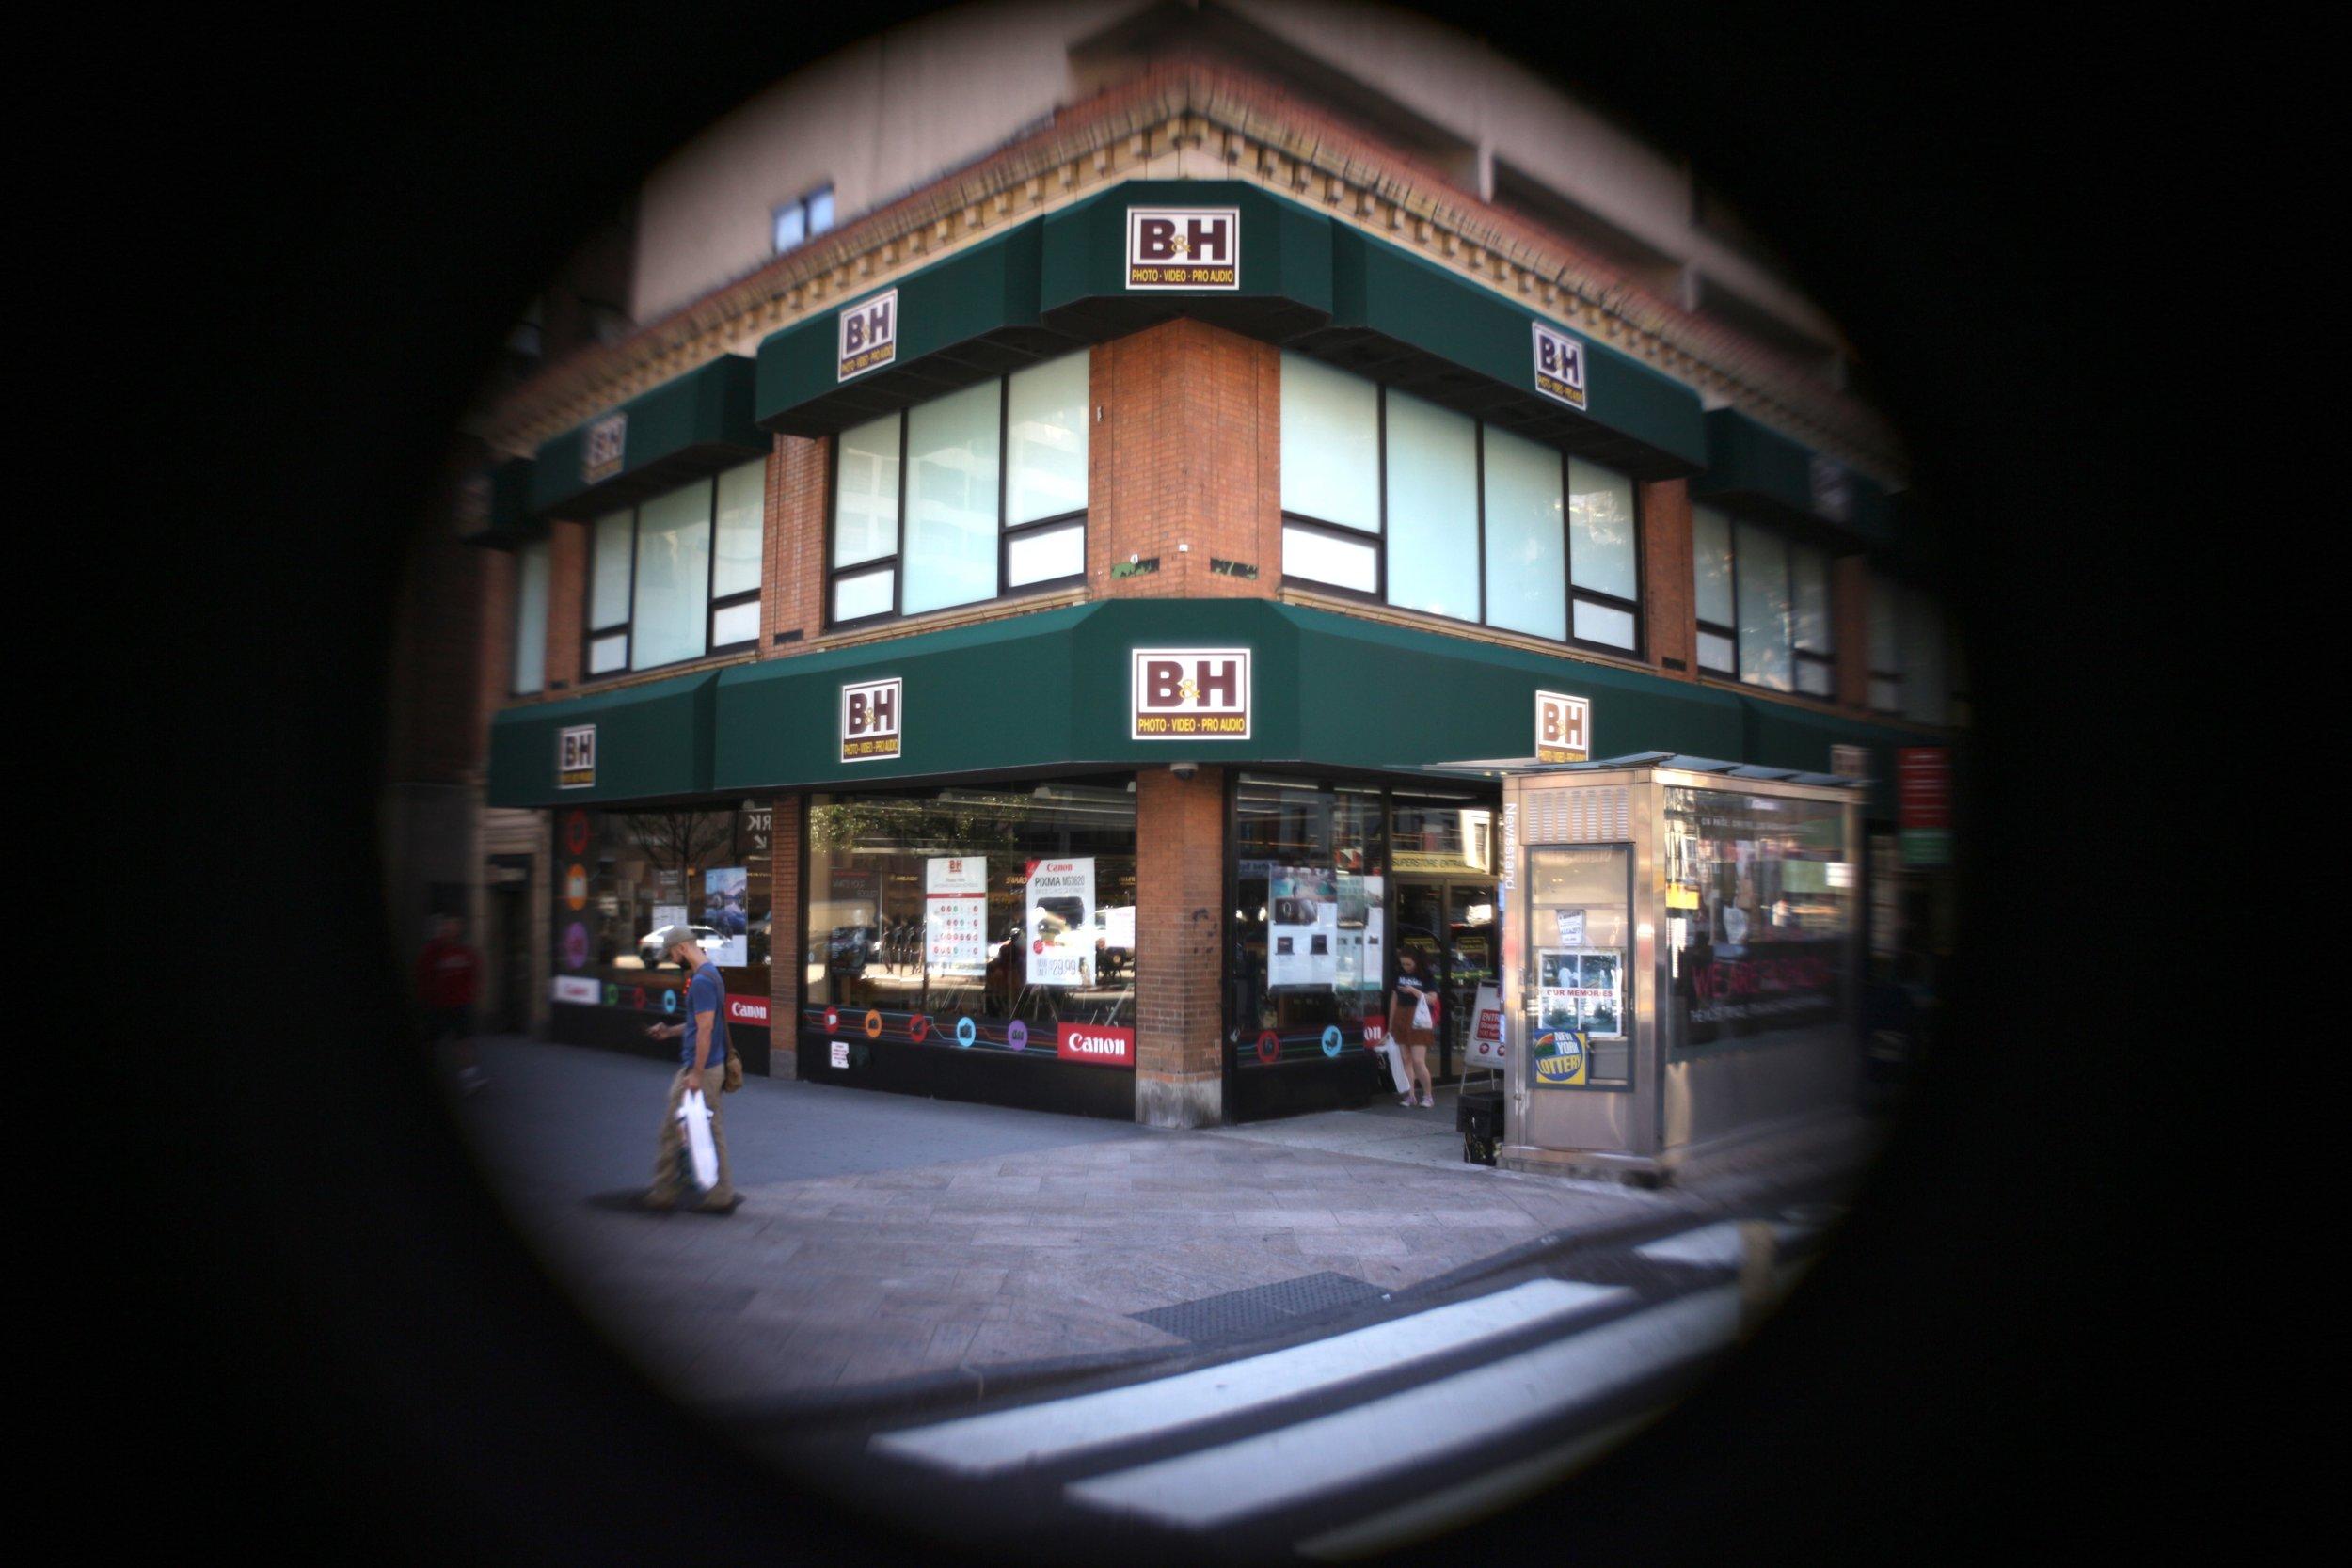 Film Camera Buying Guide B&H Photo Video